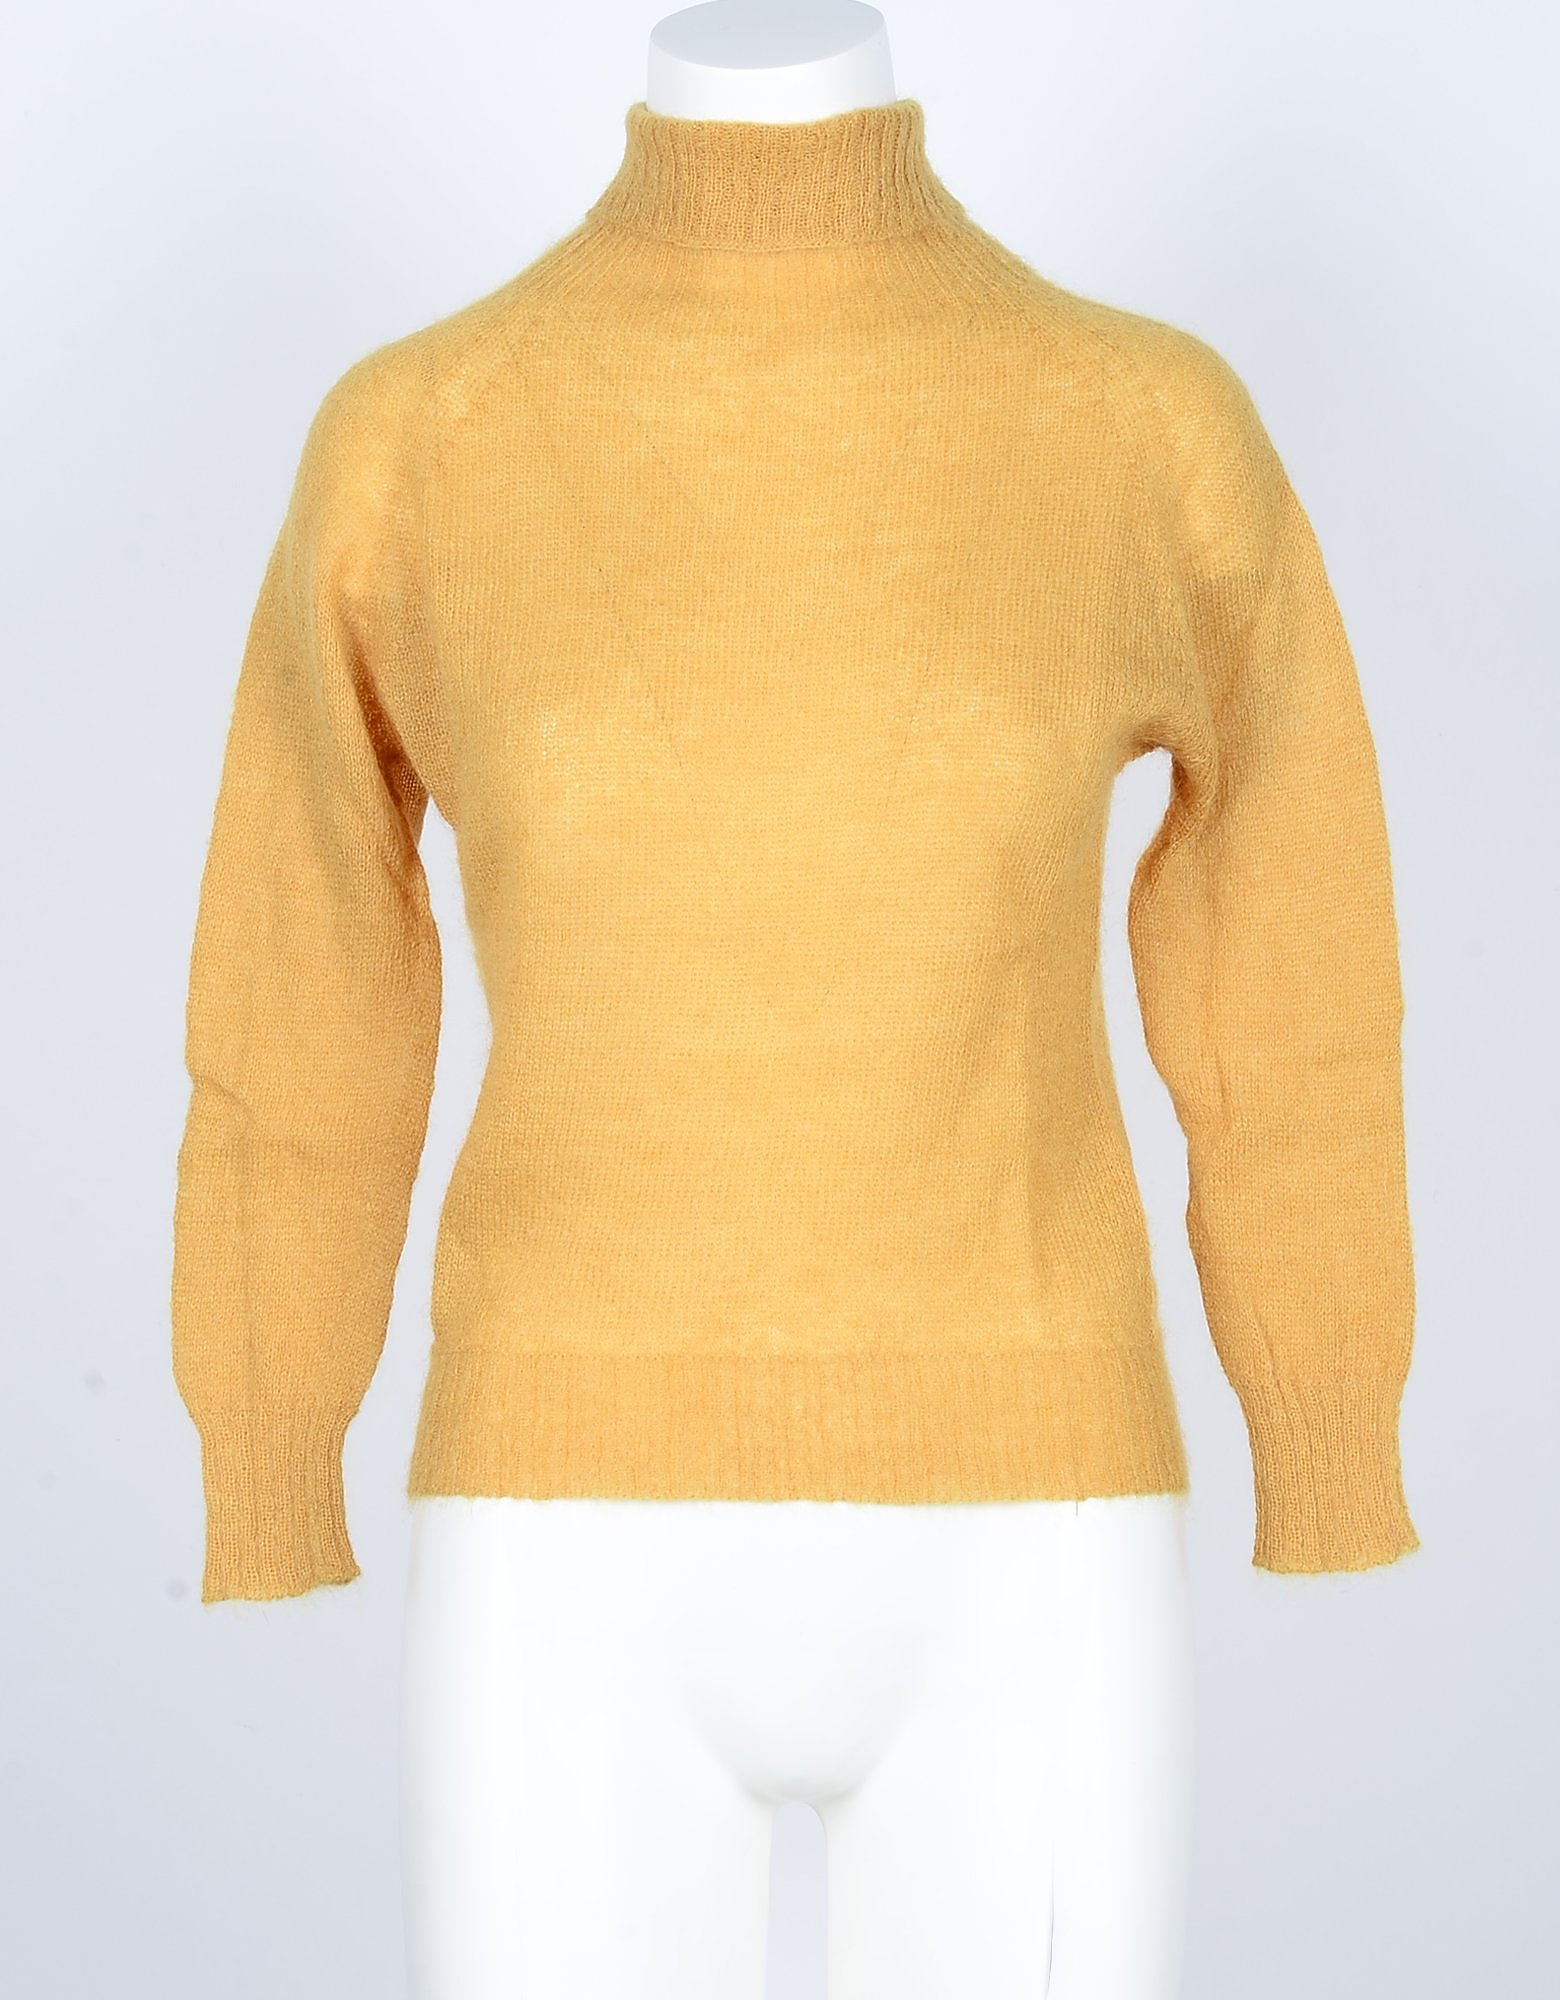 Pink Memories Designer Knitwear, Yellow Mohair Wool Blend Women's Turtleneck Sweater